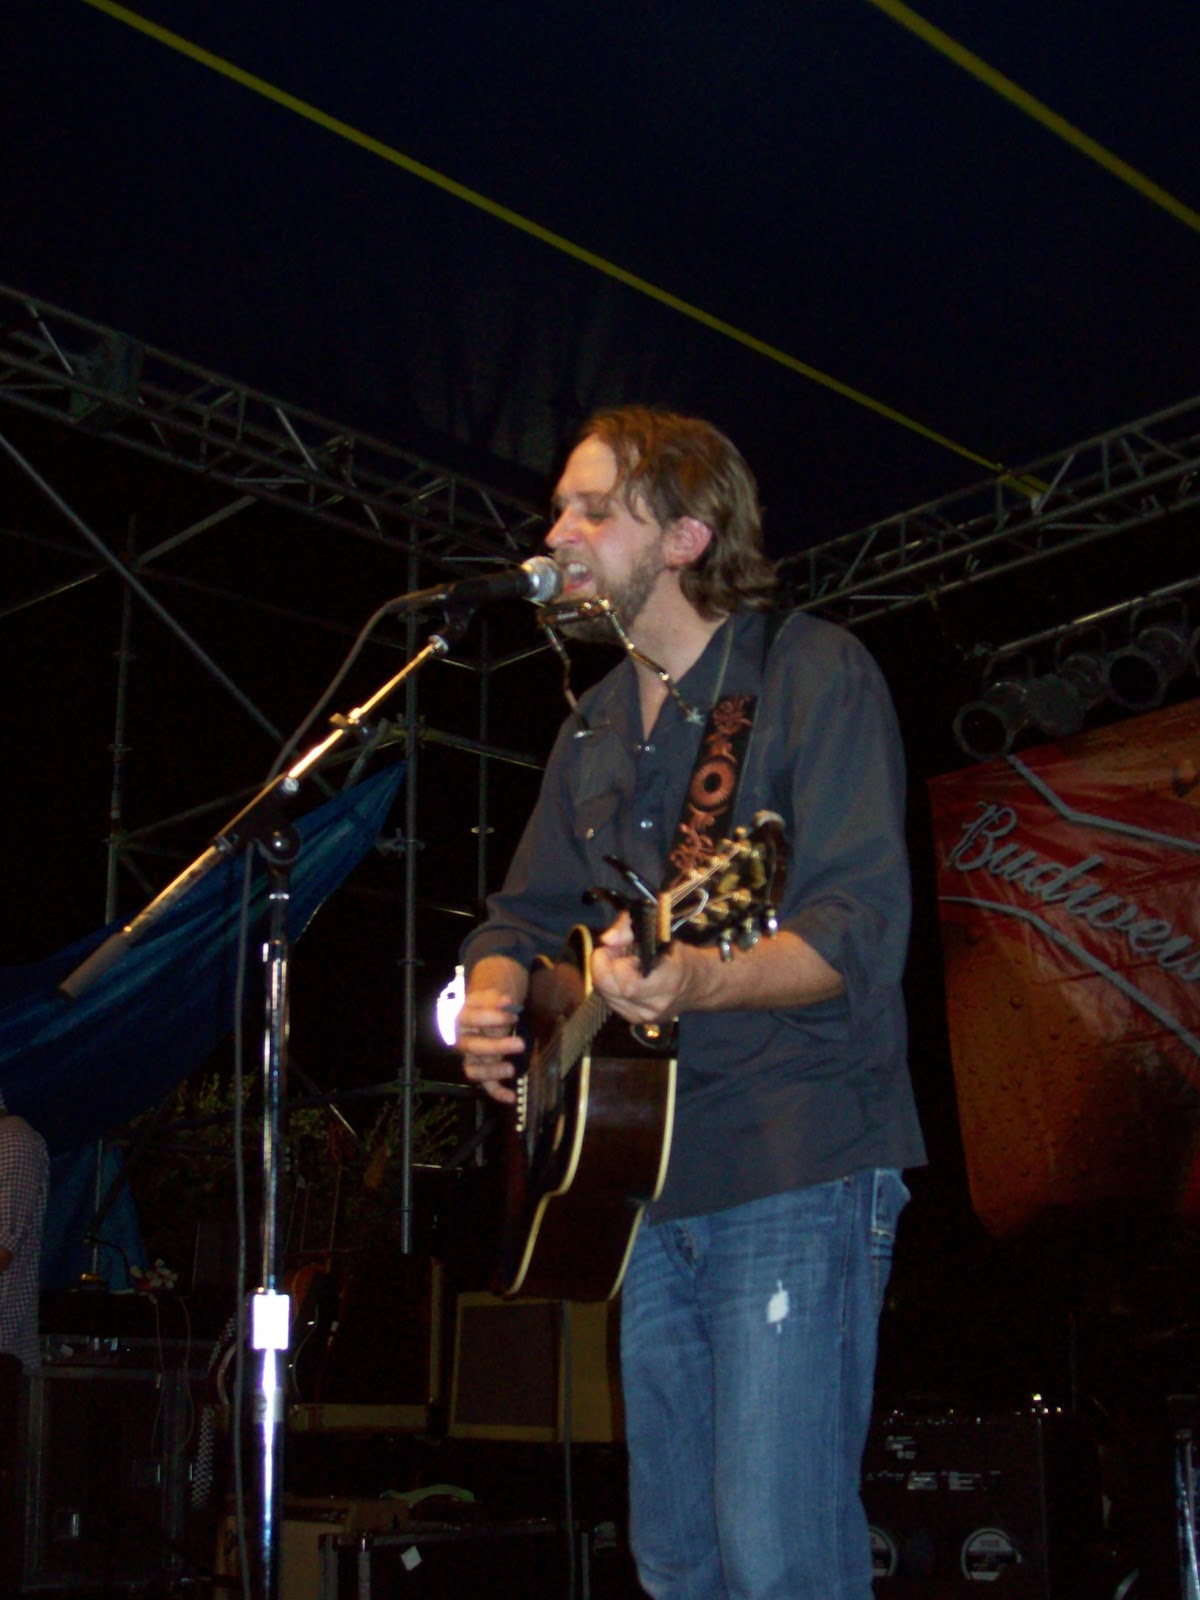 Conroe Cajun Catfish Festival - 101_0521.JPG